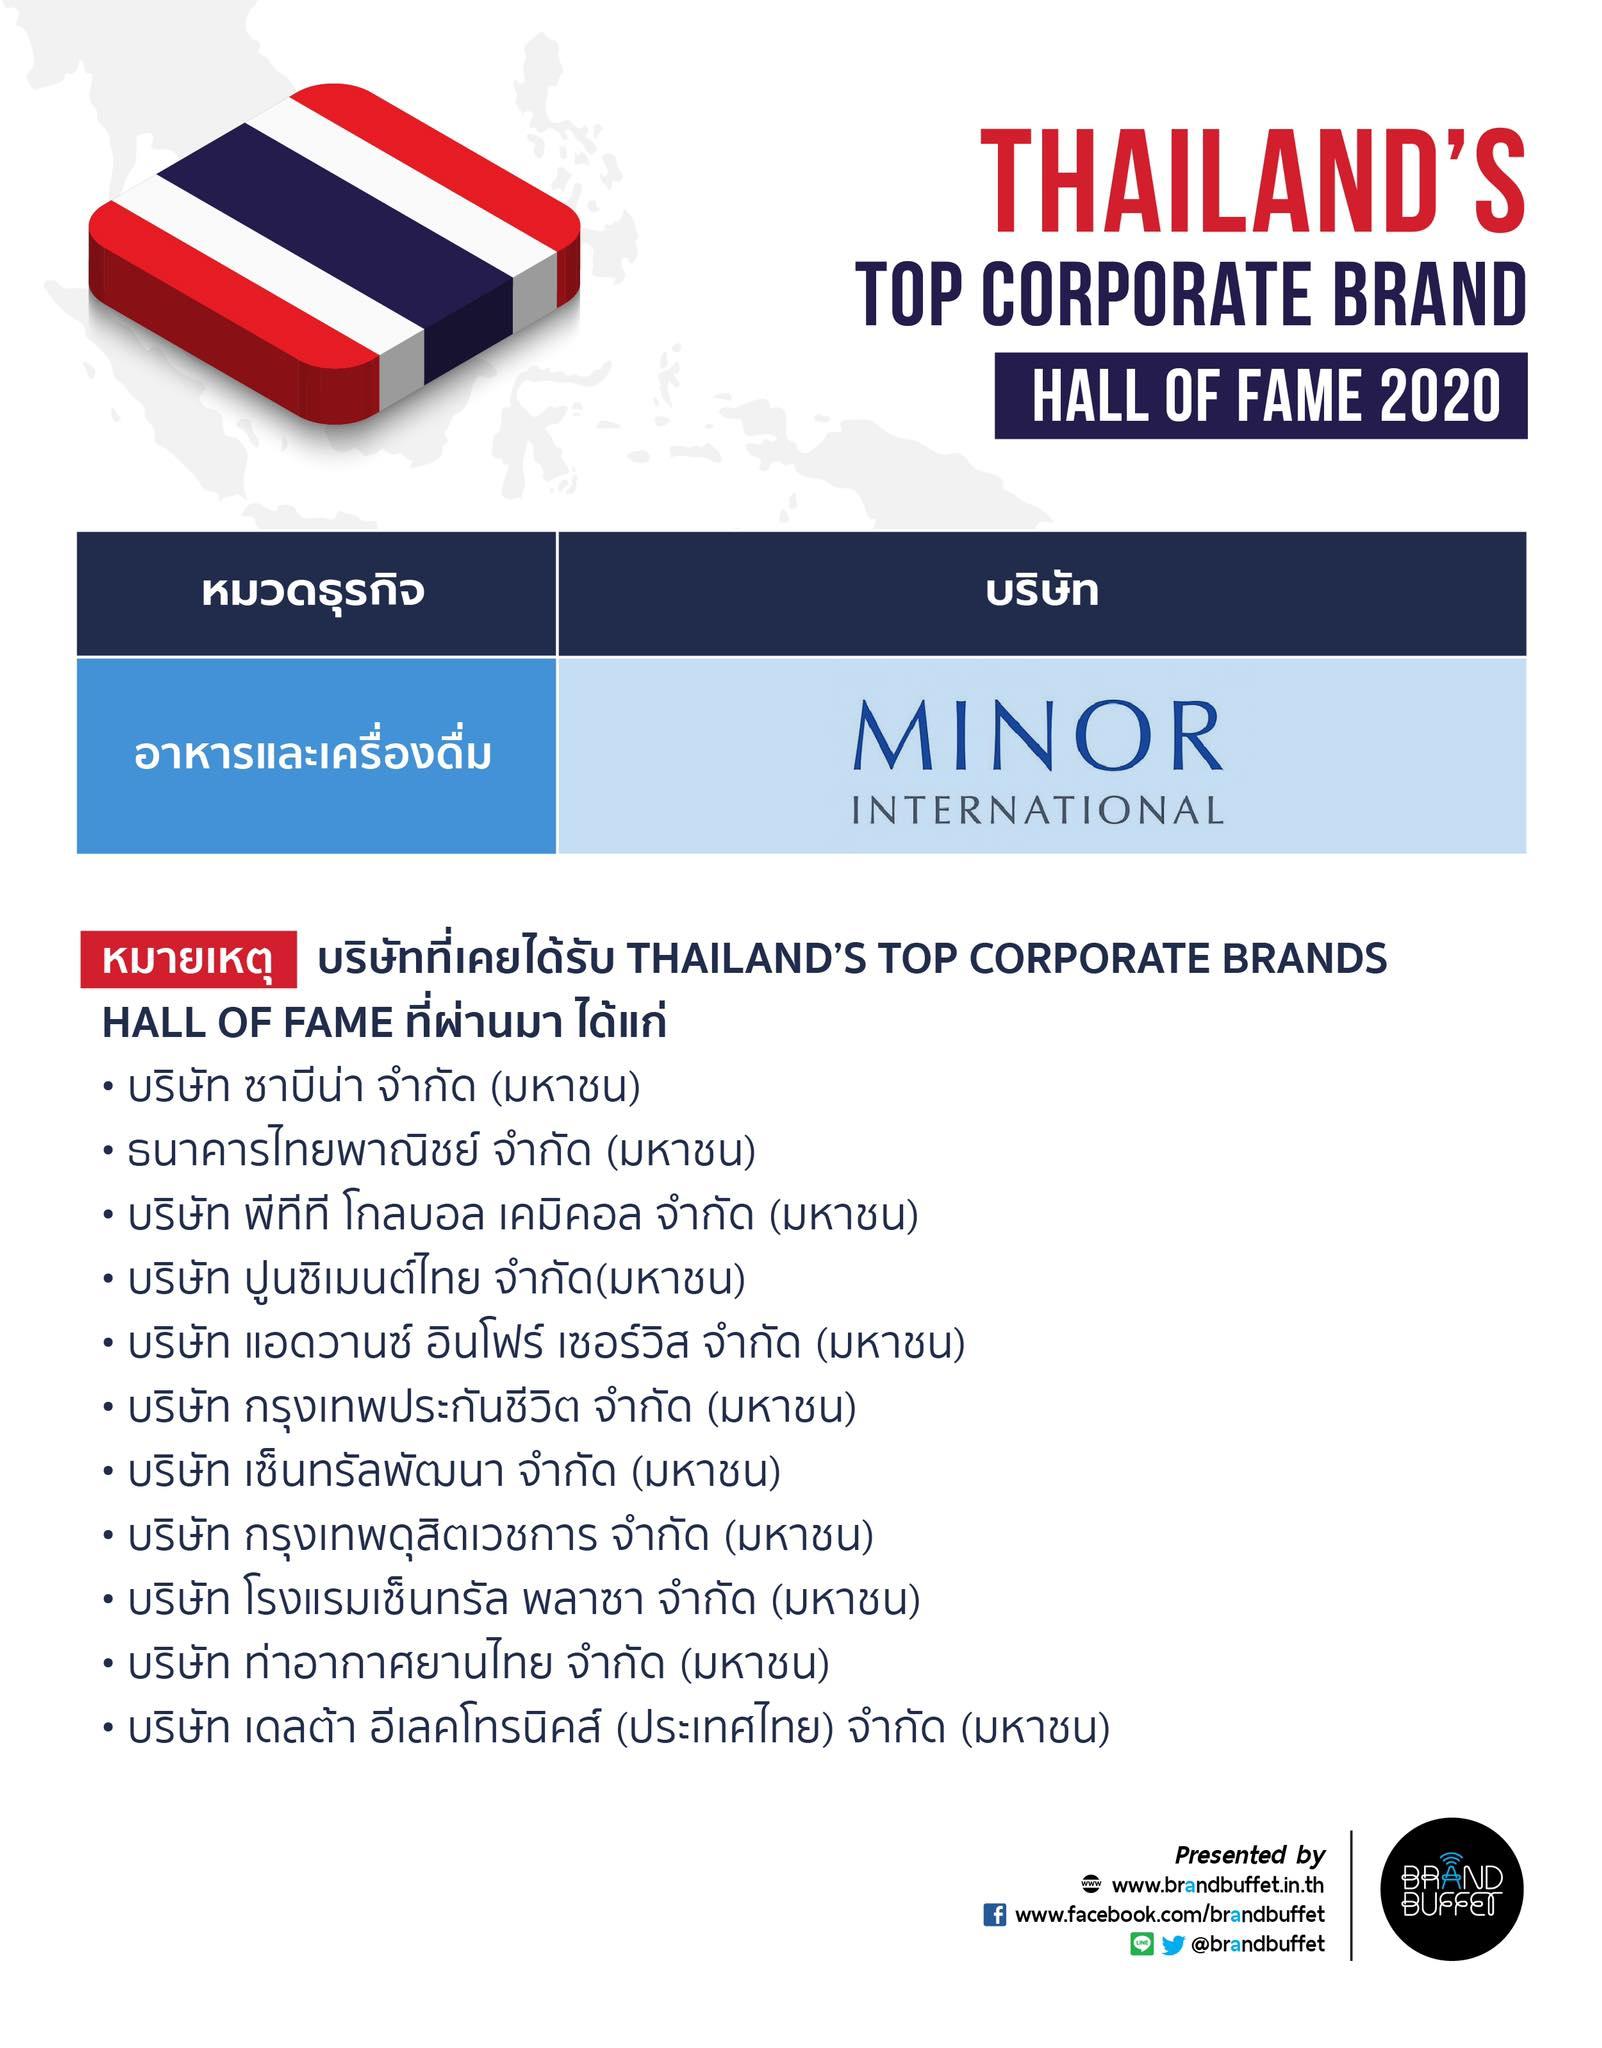 Thailand's Top Corporate Brands 2020